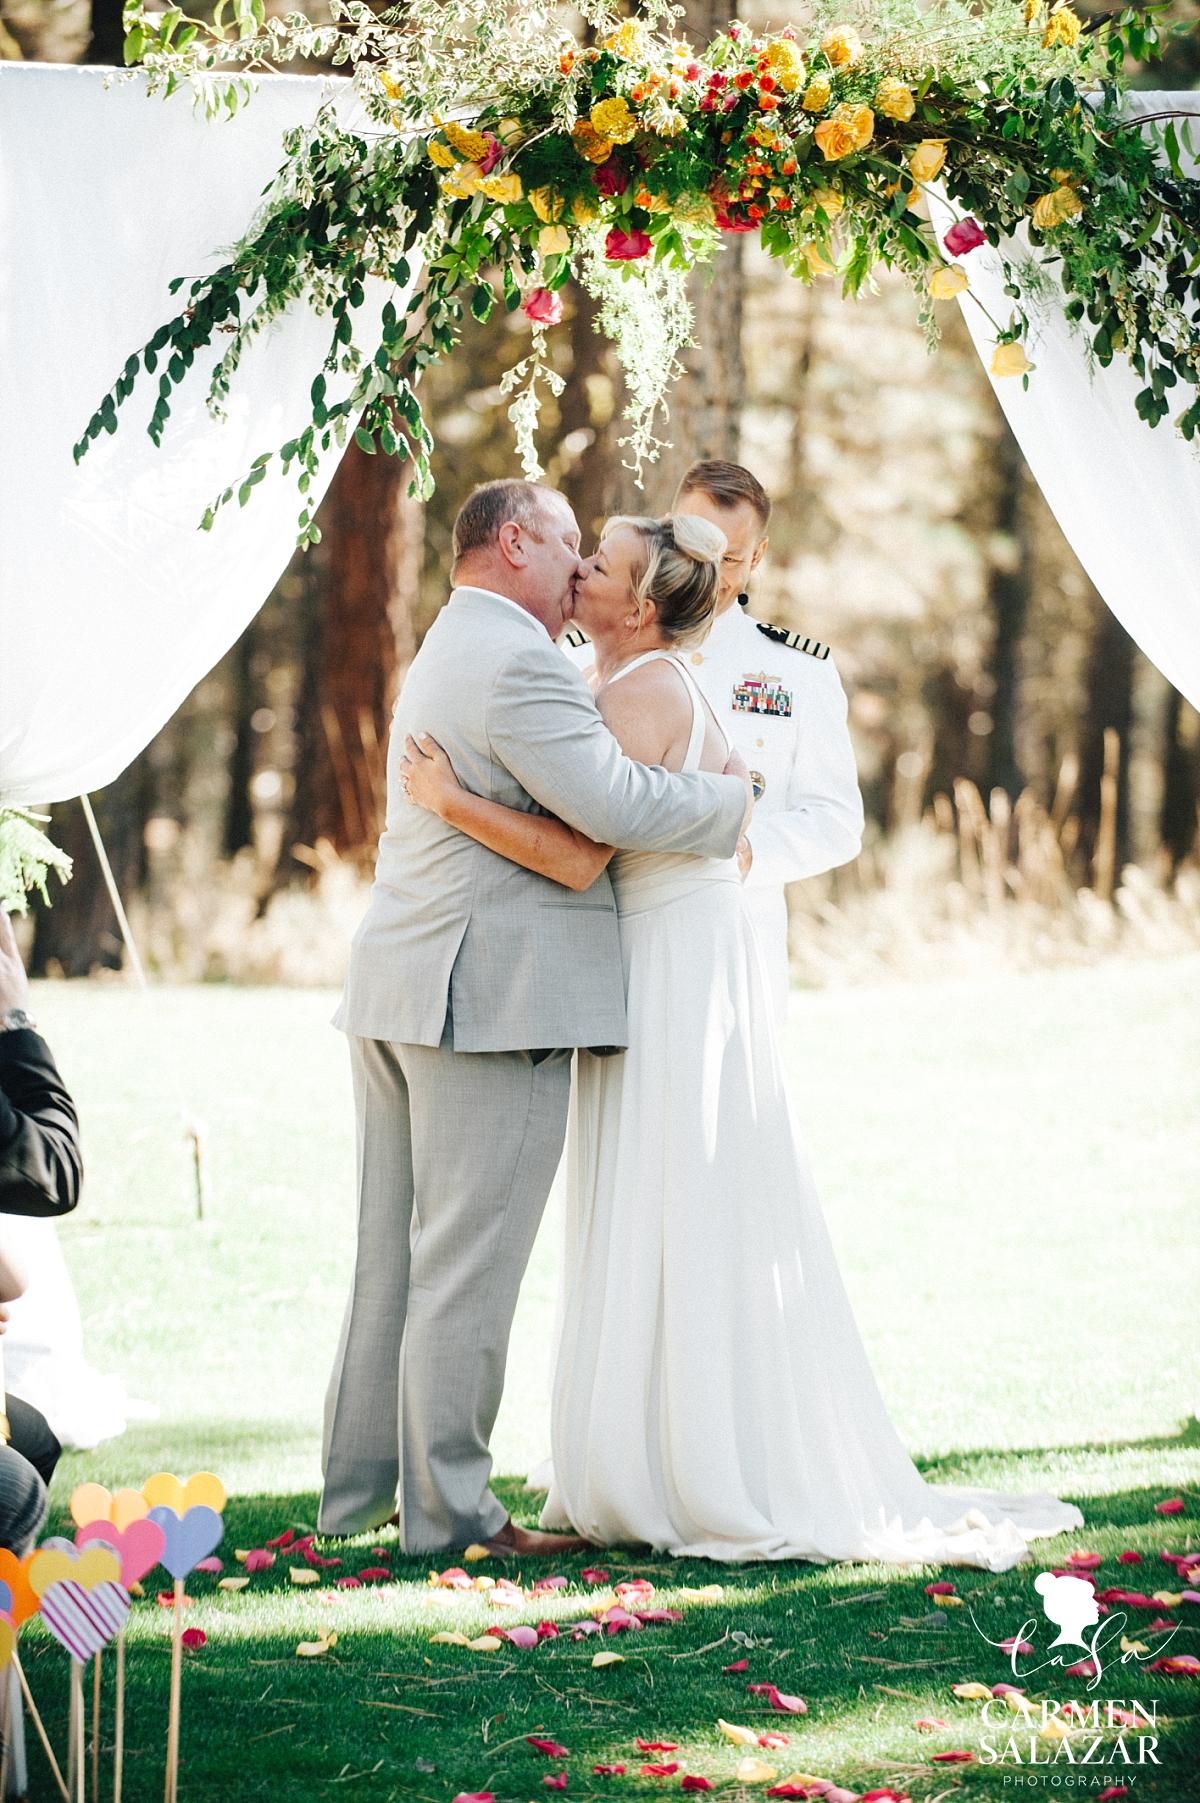 First kiss at Chalet View Lodge fall wedding - Carmen Salazar